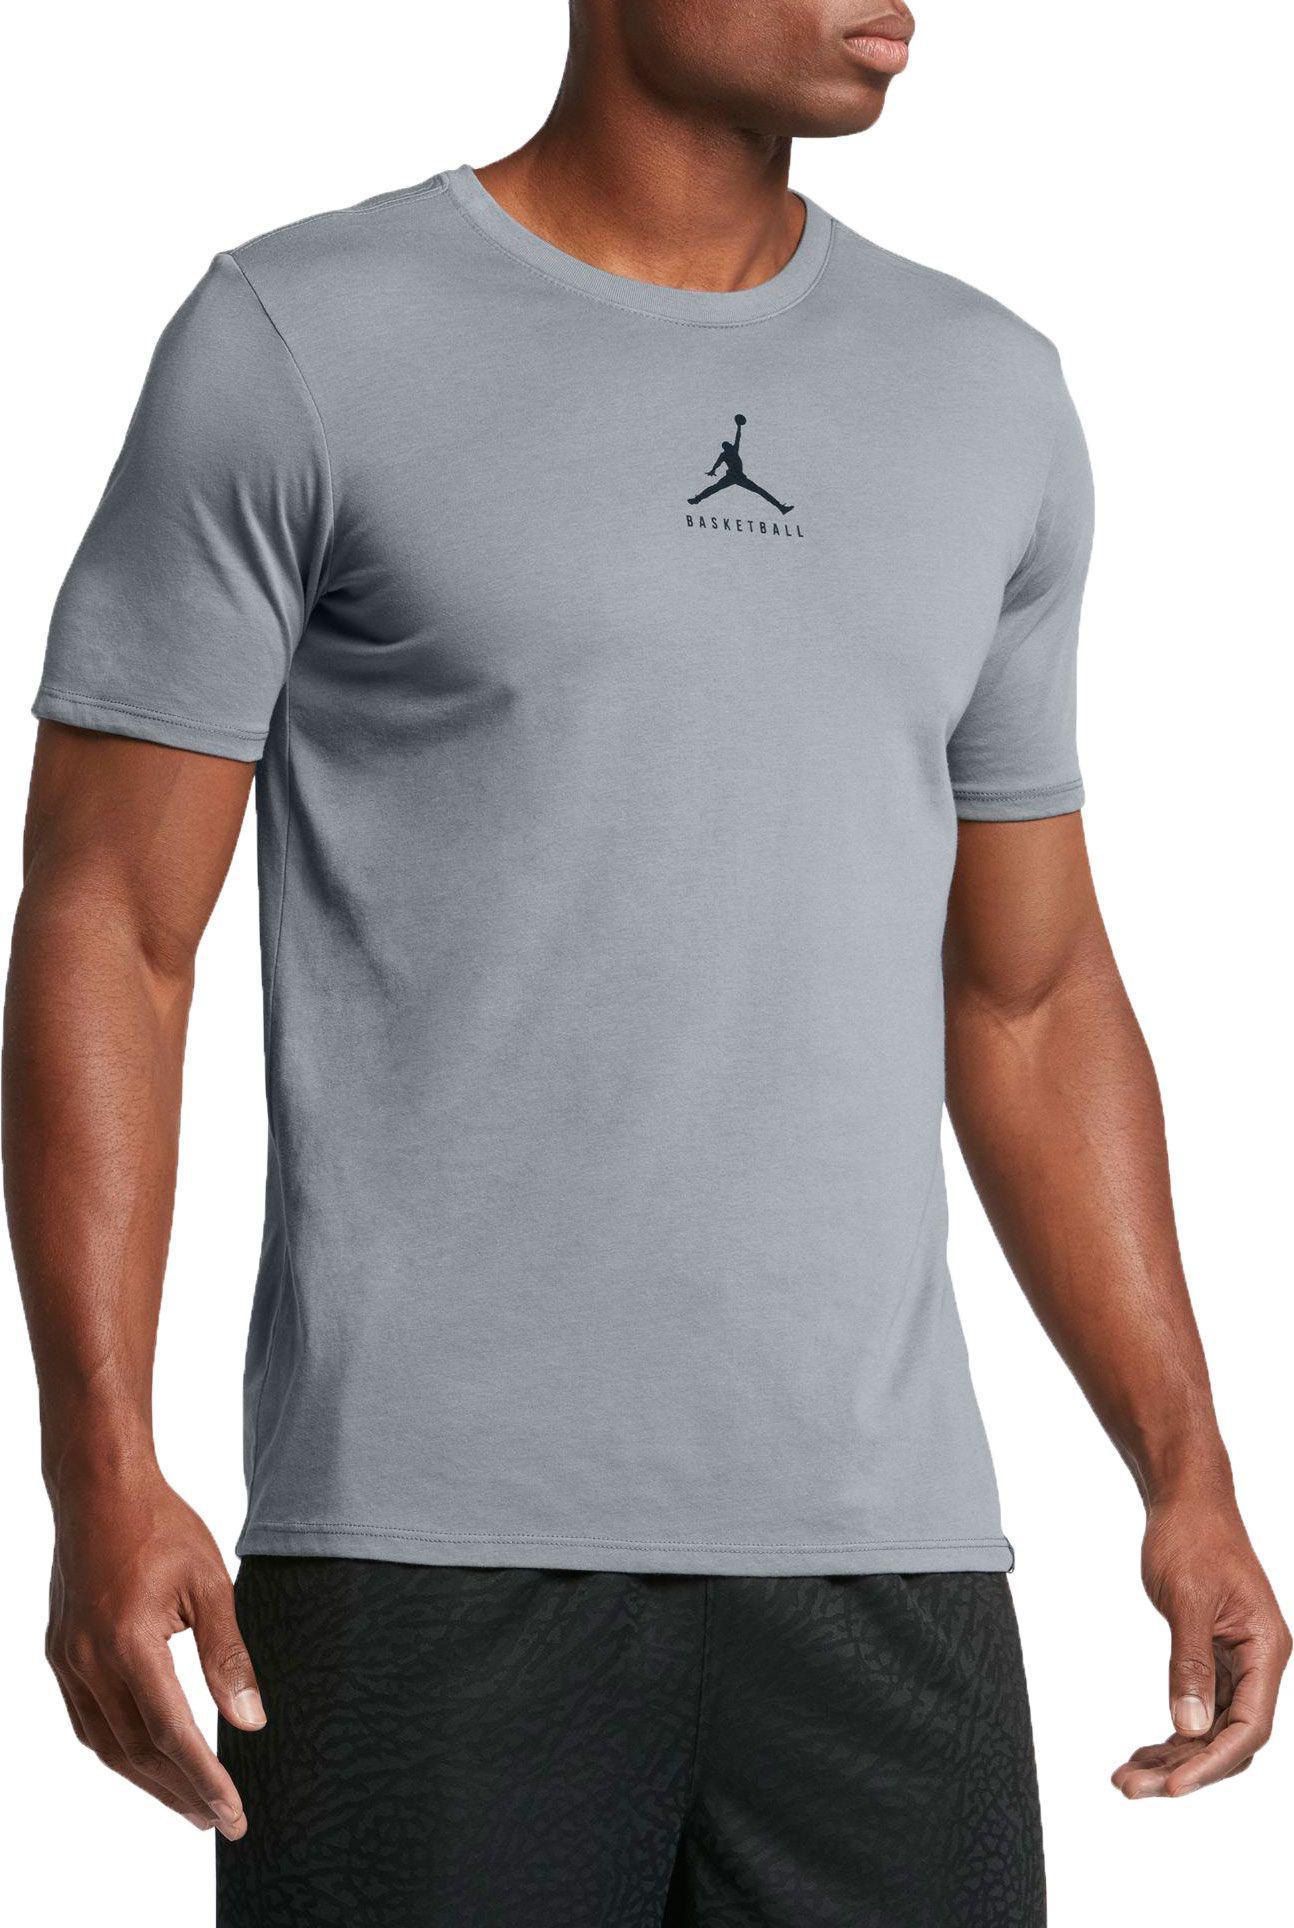 Jordan Dry 23/7 Jumpman Basketball Men's T-Shirts Cool Grey/Black